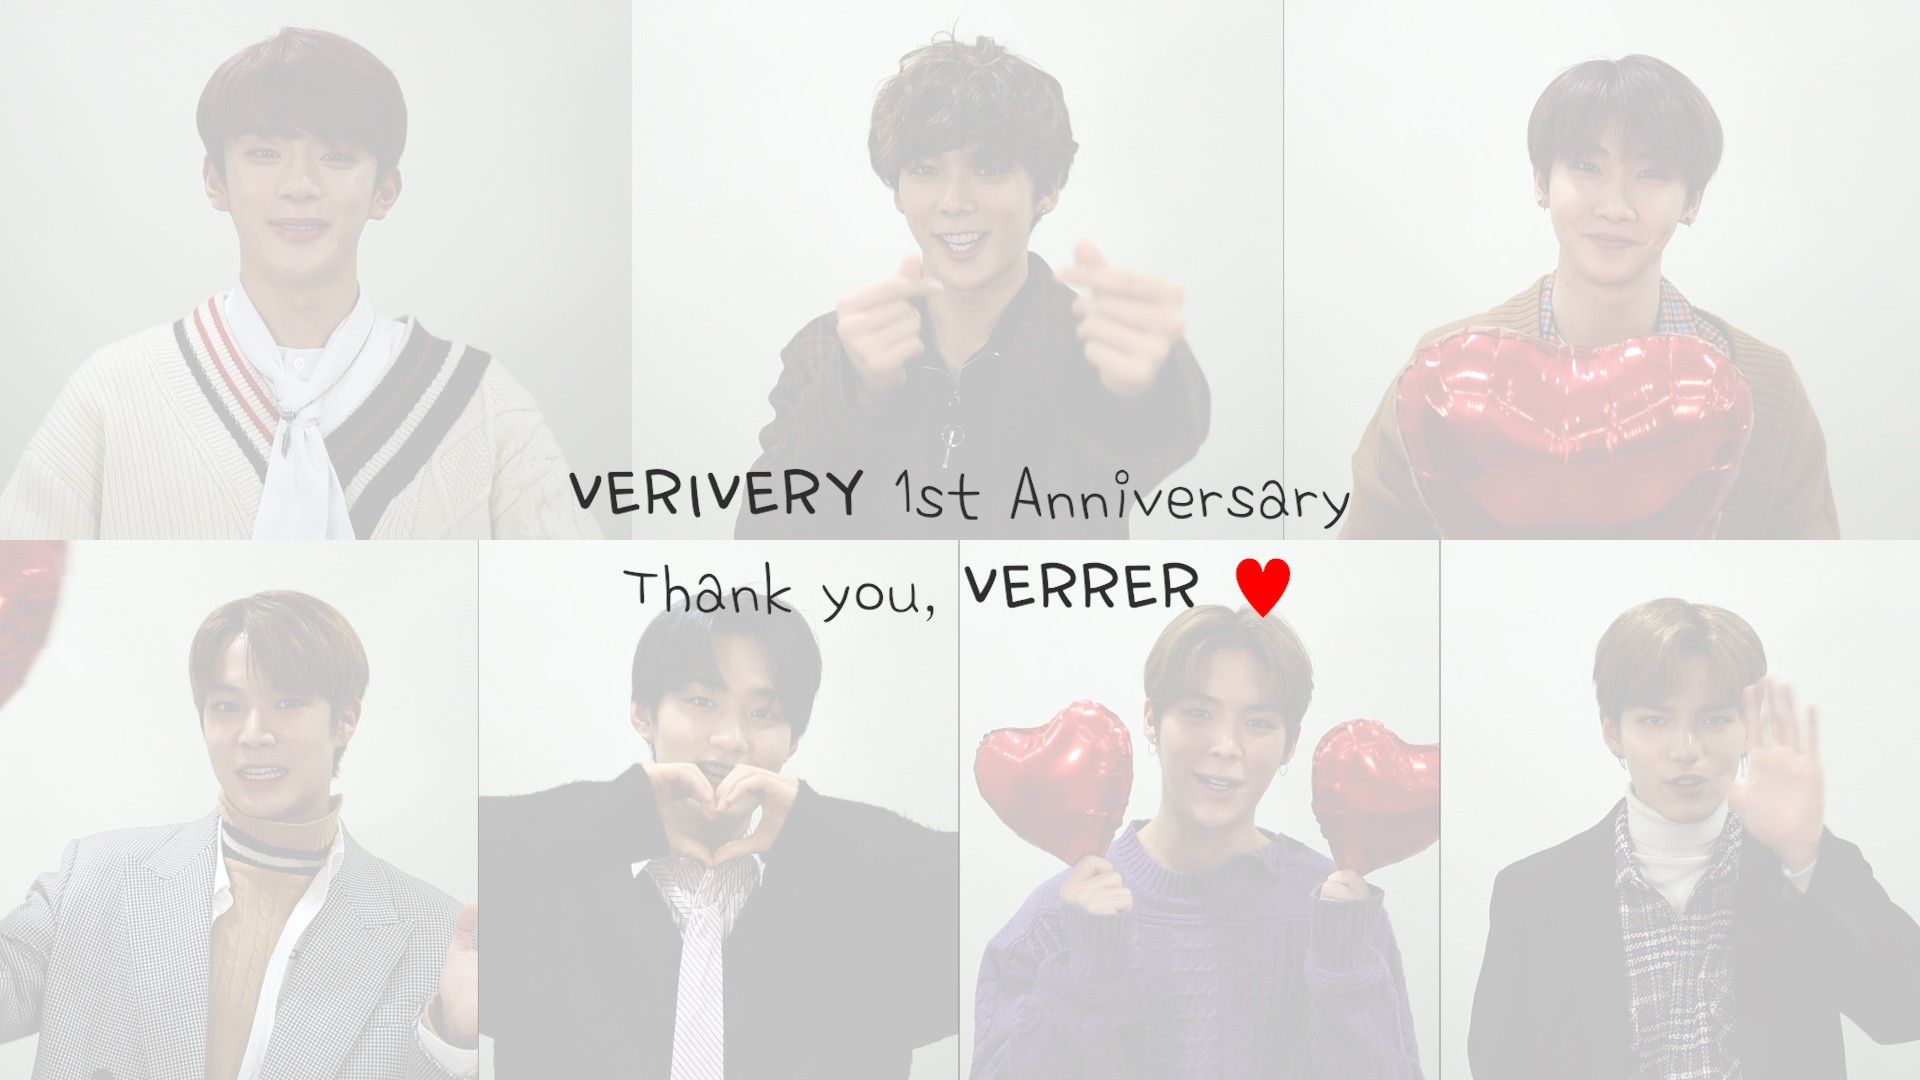 VERIVERY 1st Anniversary Message♥